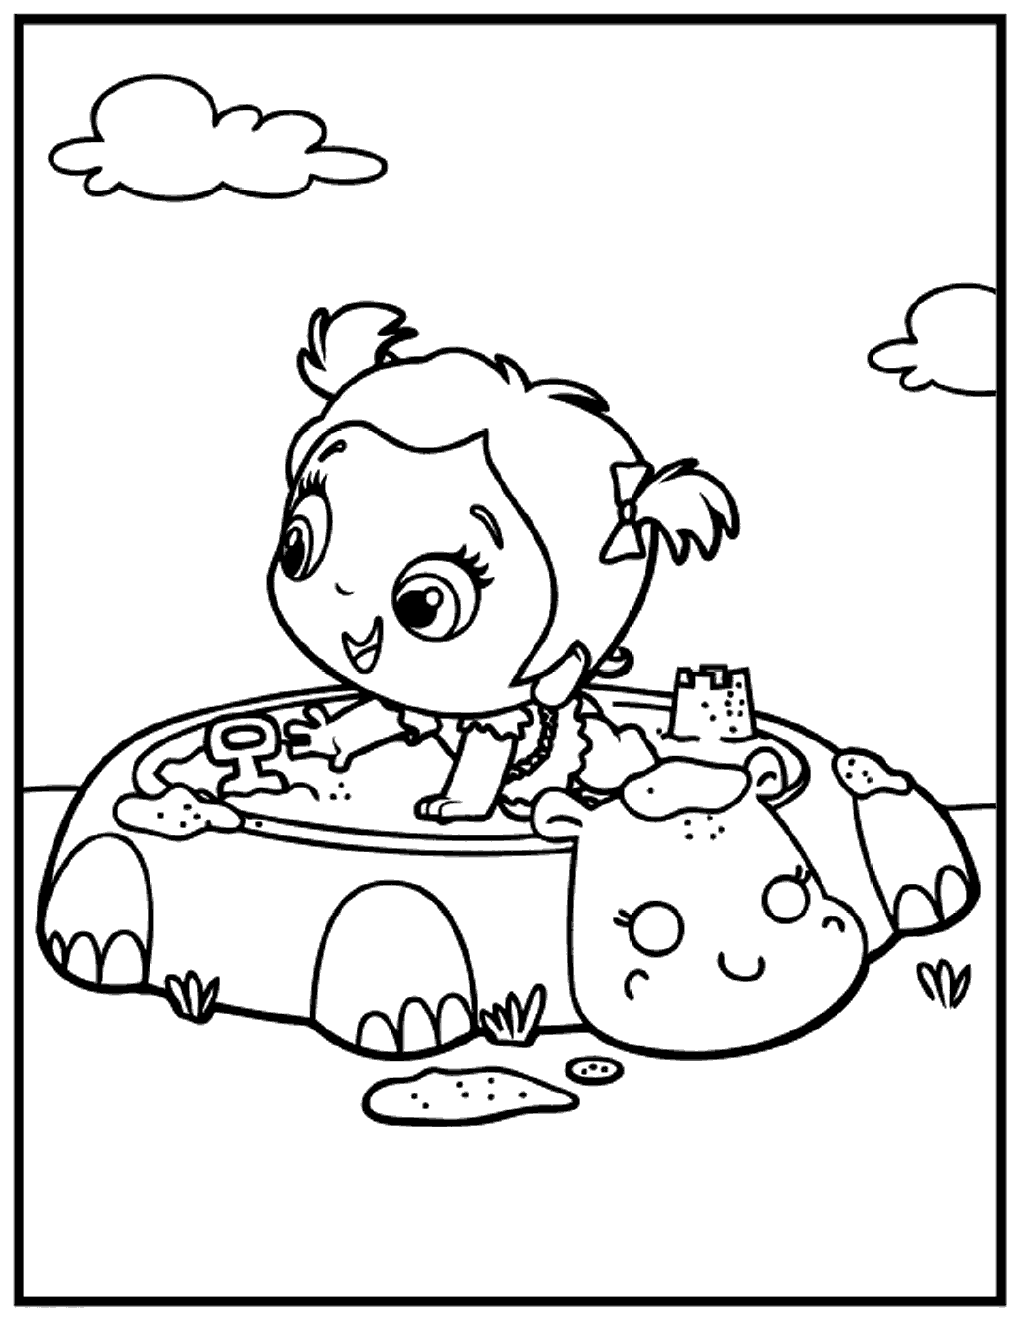 Sandbox Drawing at GetDrawings.com | Free for personal use ...